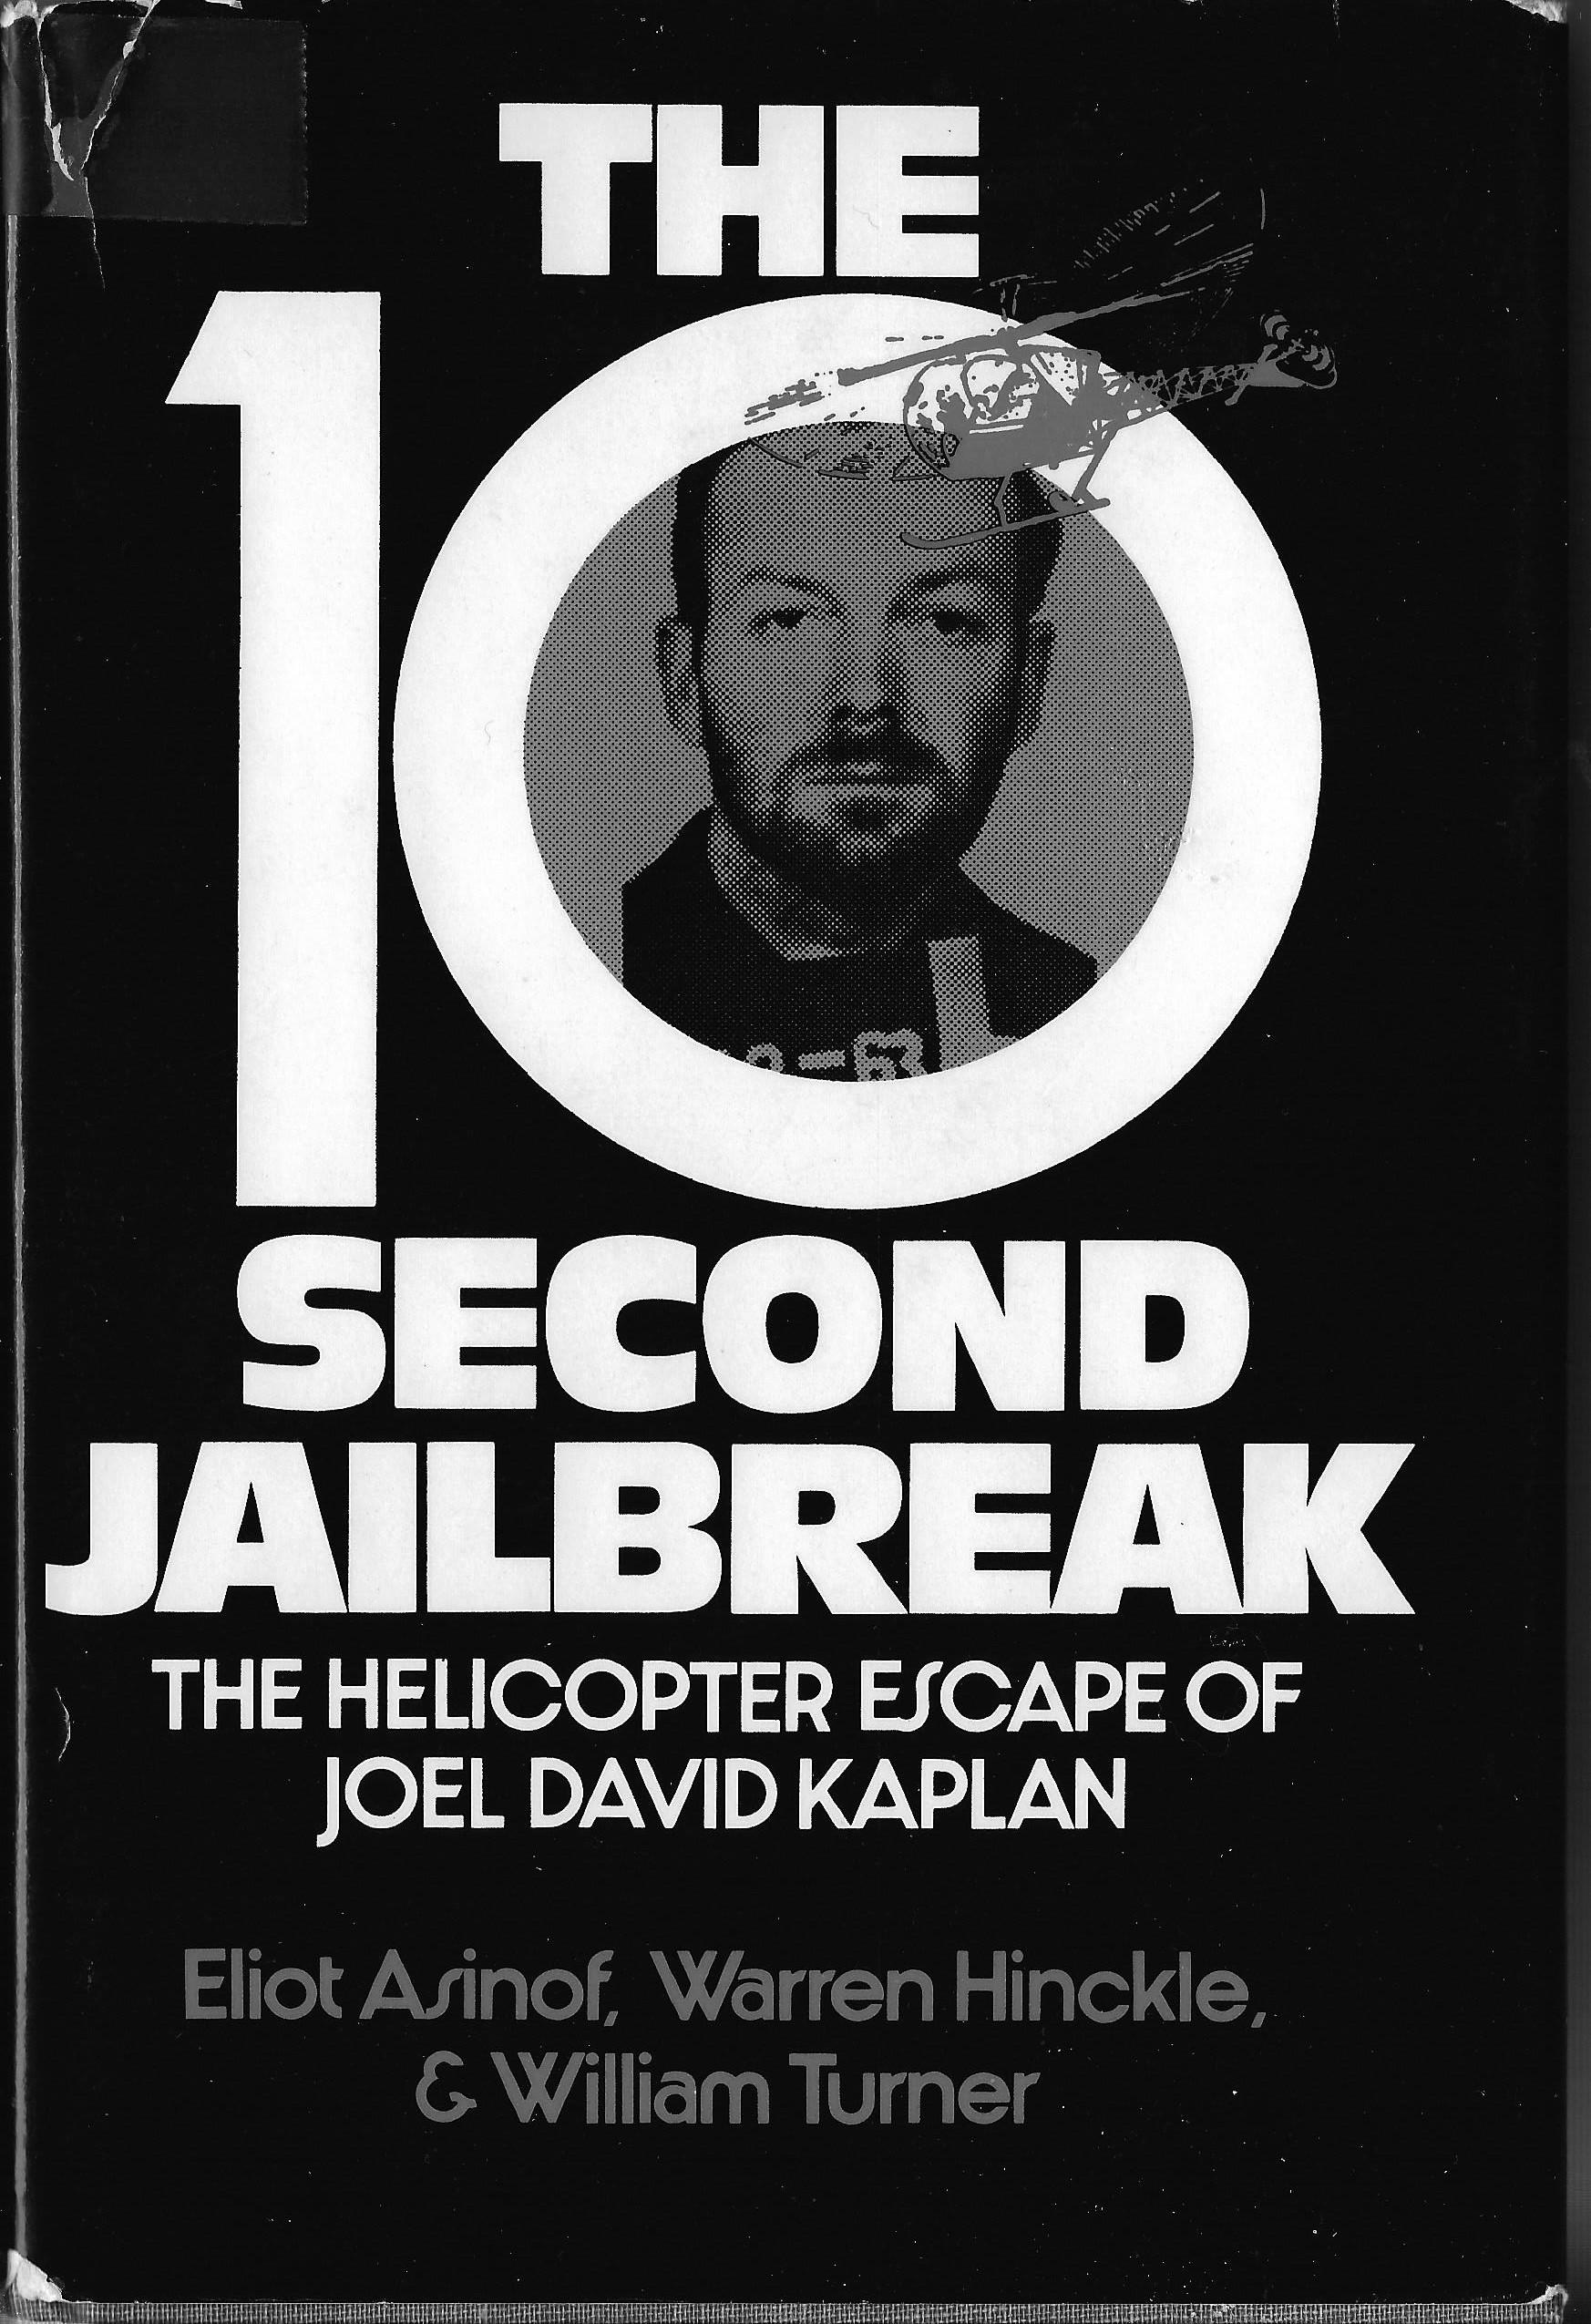 The 10-Second Jailbreak - image courtesy of Maureen Koehl